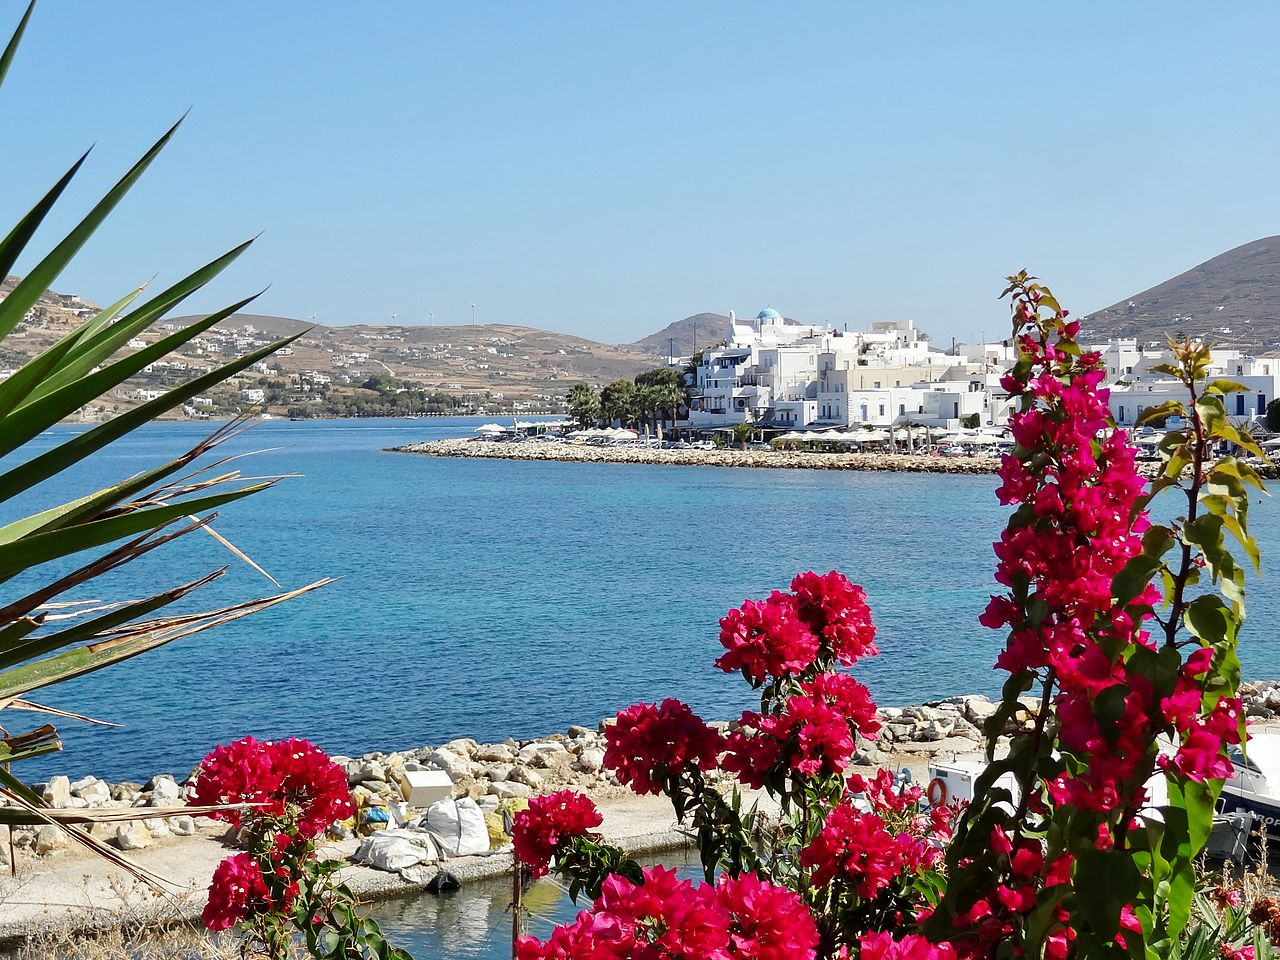 Parikia île de Paros